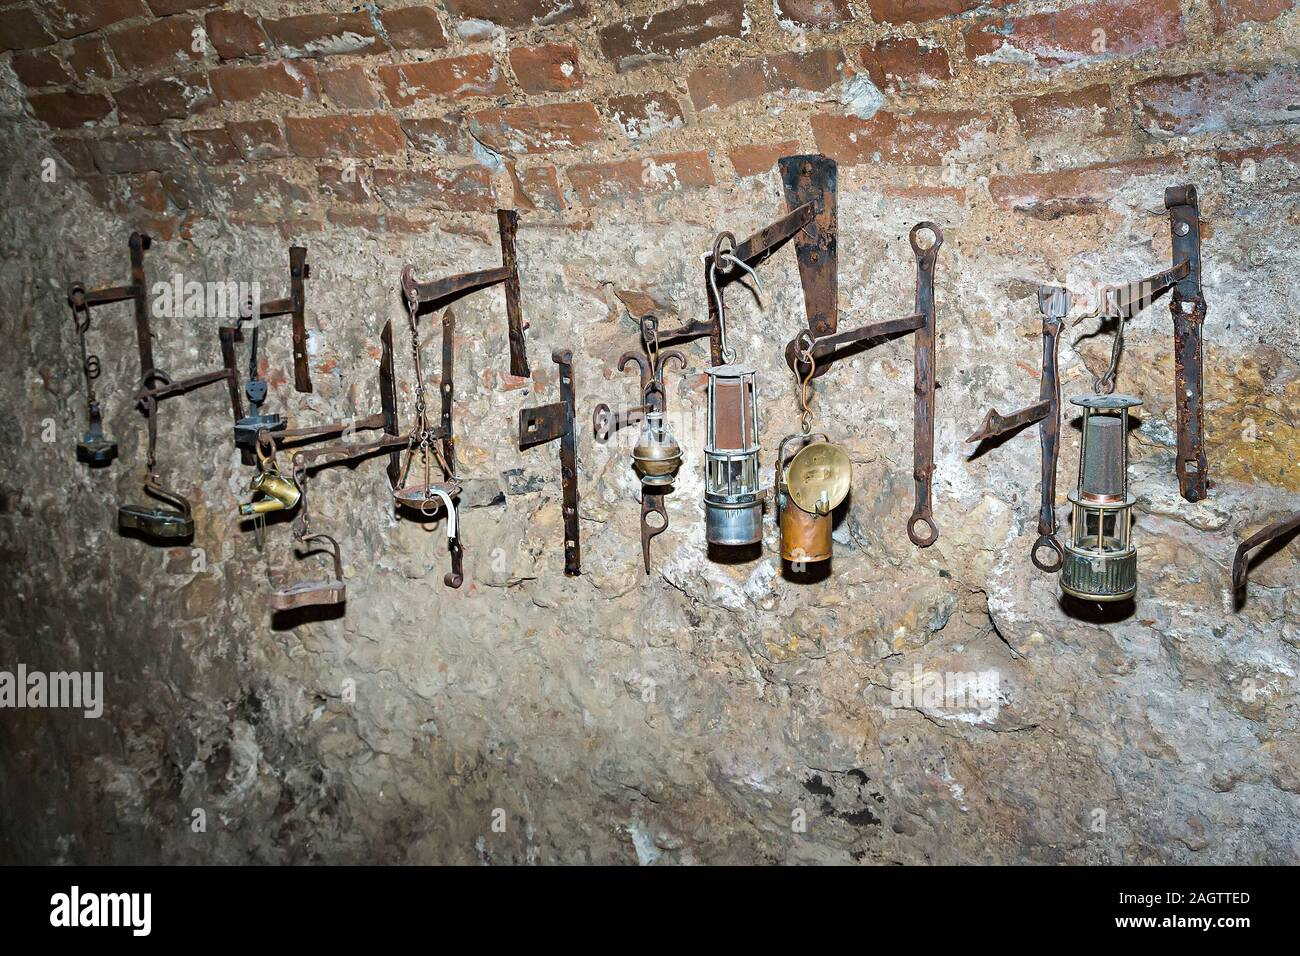 Lamp exhibit in the Labyrinth underground tunnels, Brno, Czech Republic Stock Photo